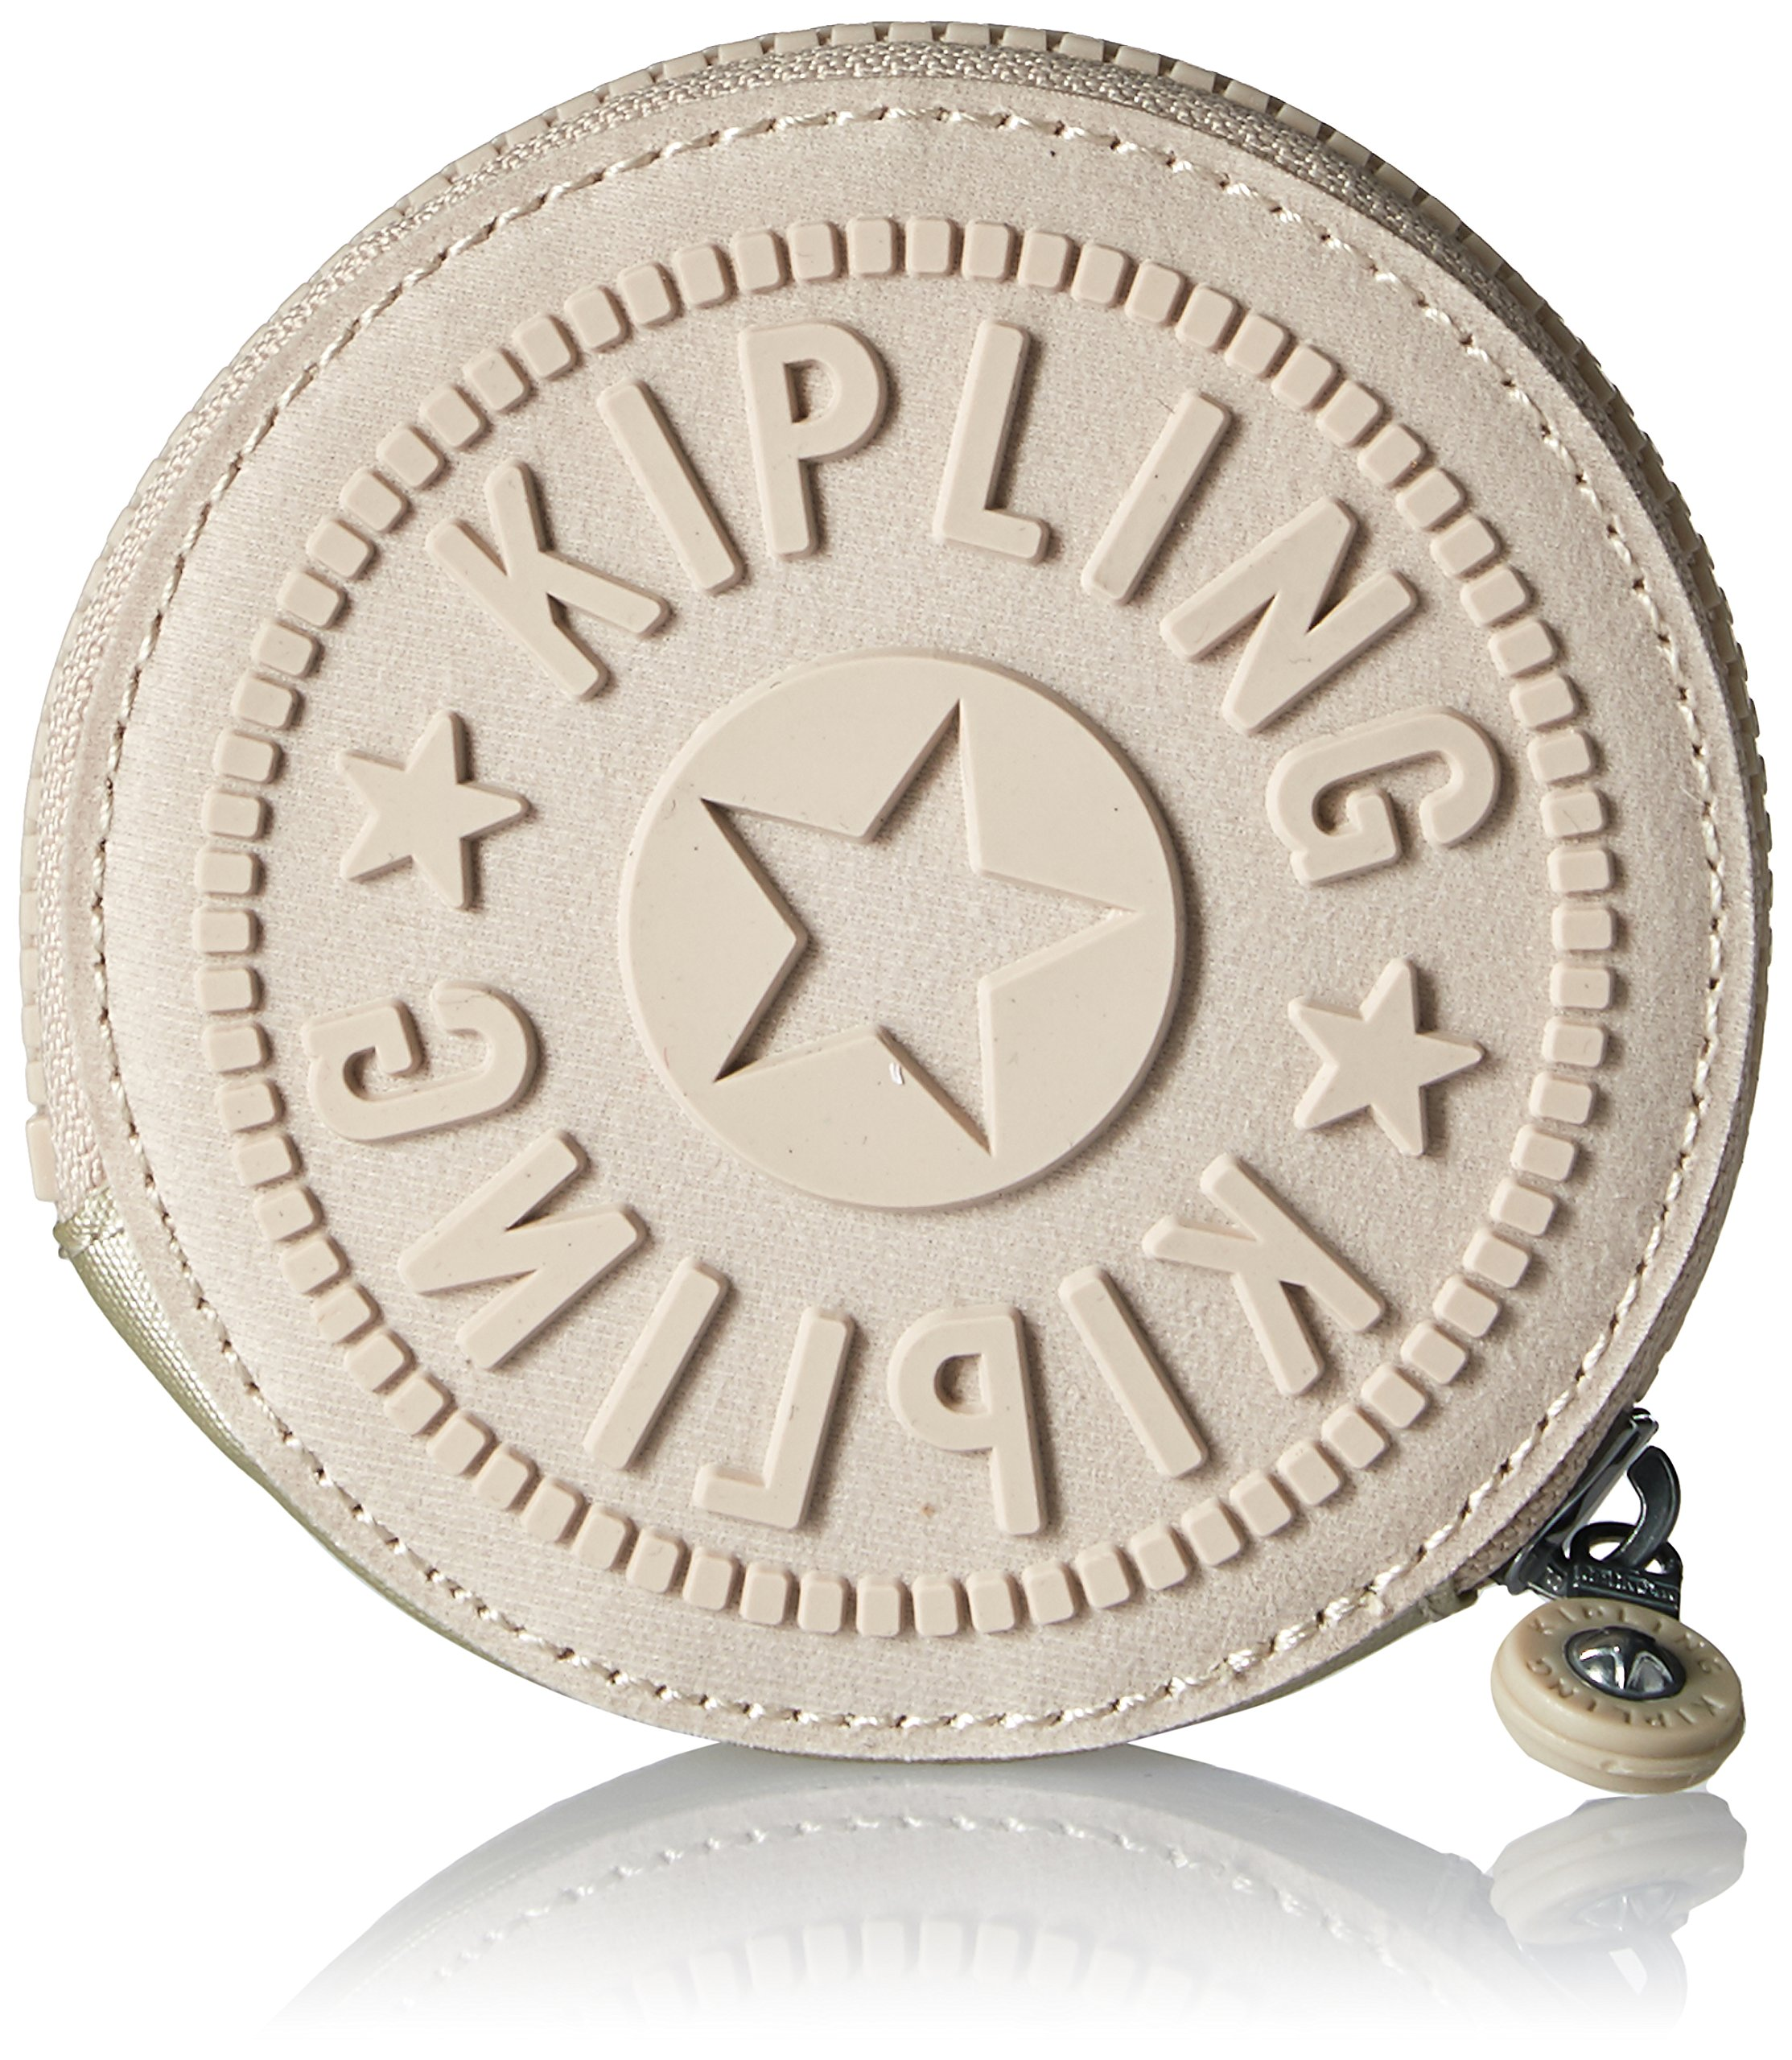 Kipling Women's Aeryn Gm Coin Purse, Sparklygld, One Size